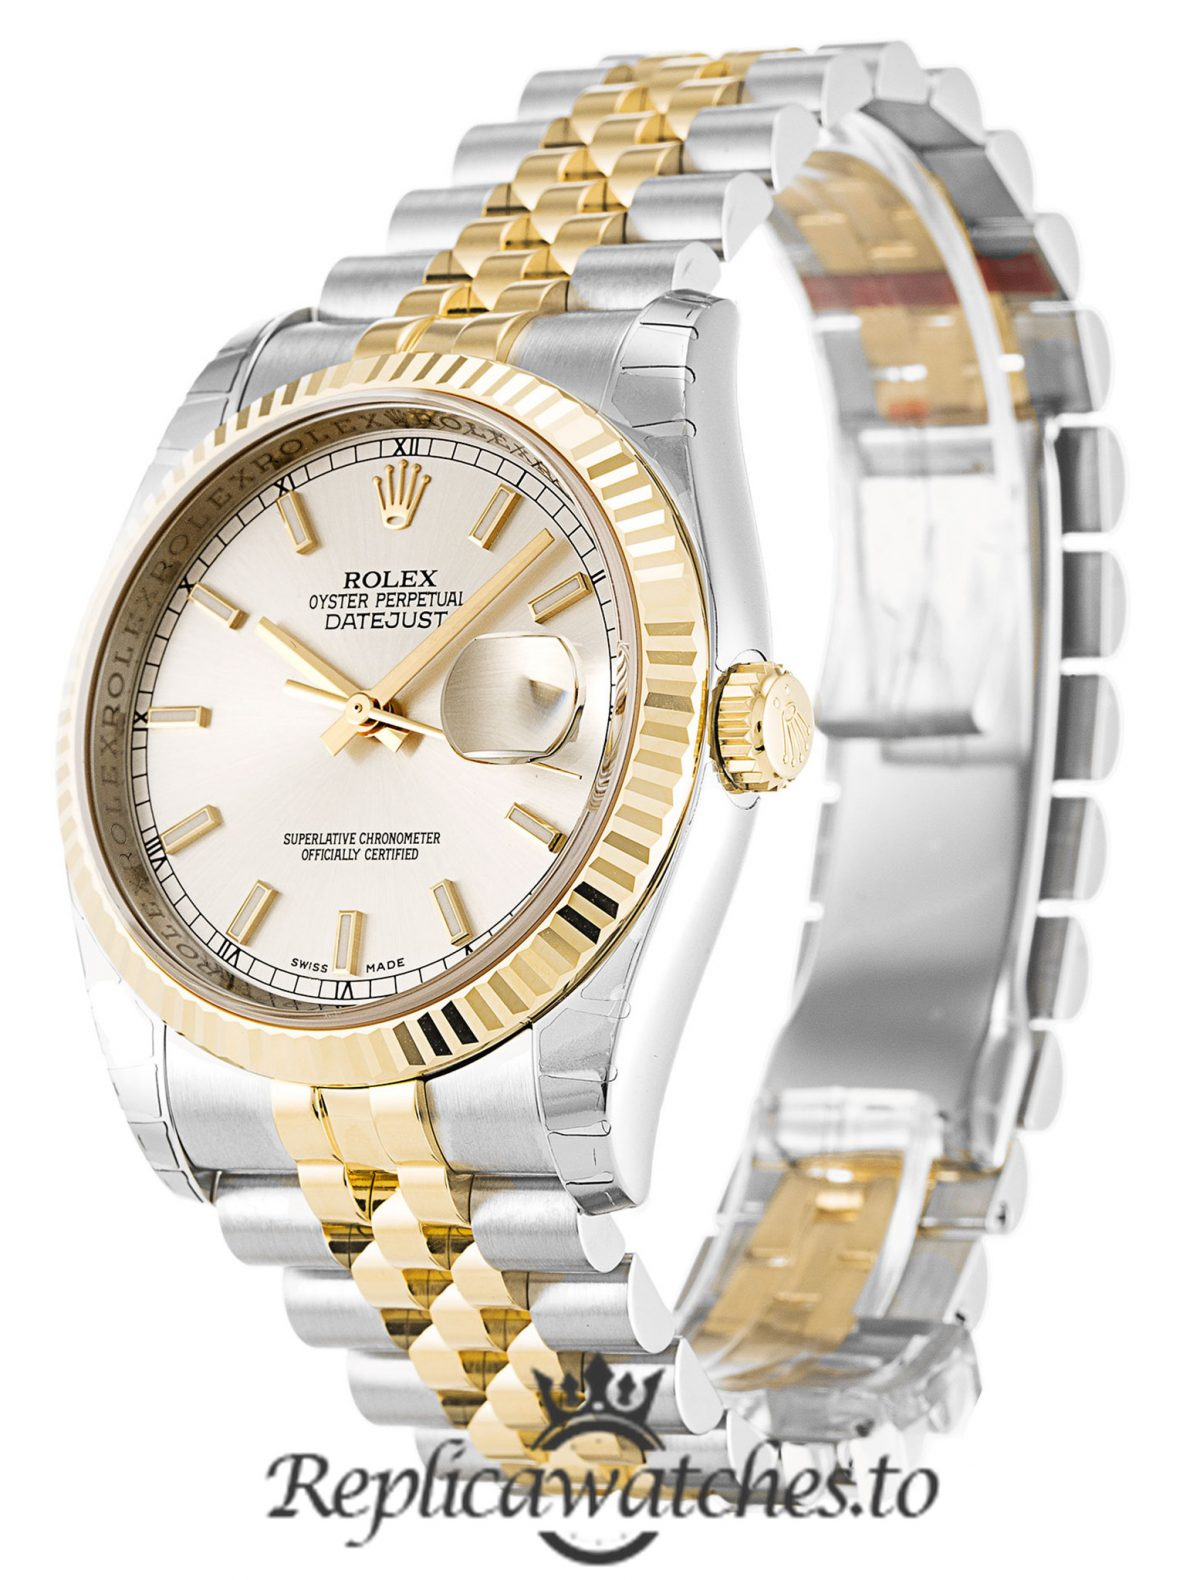 Rolex Datejust Replica 116233 003 Silver Dial 36MM